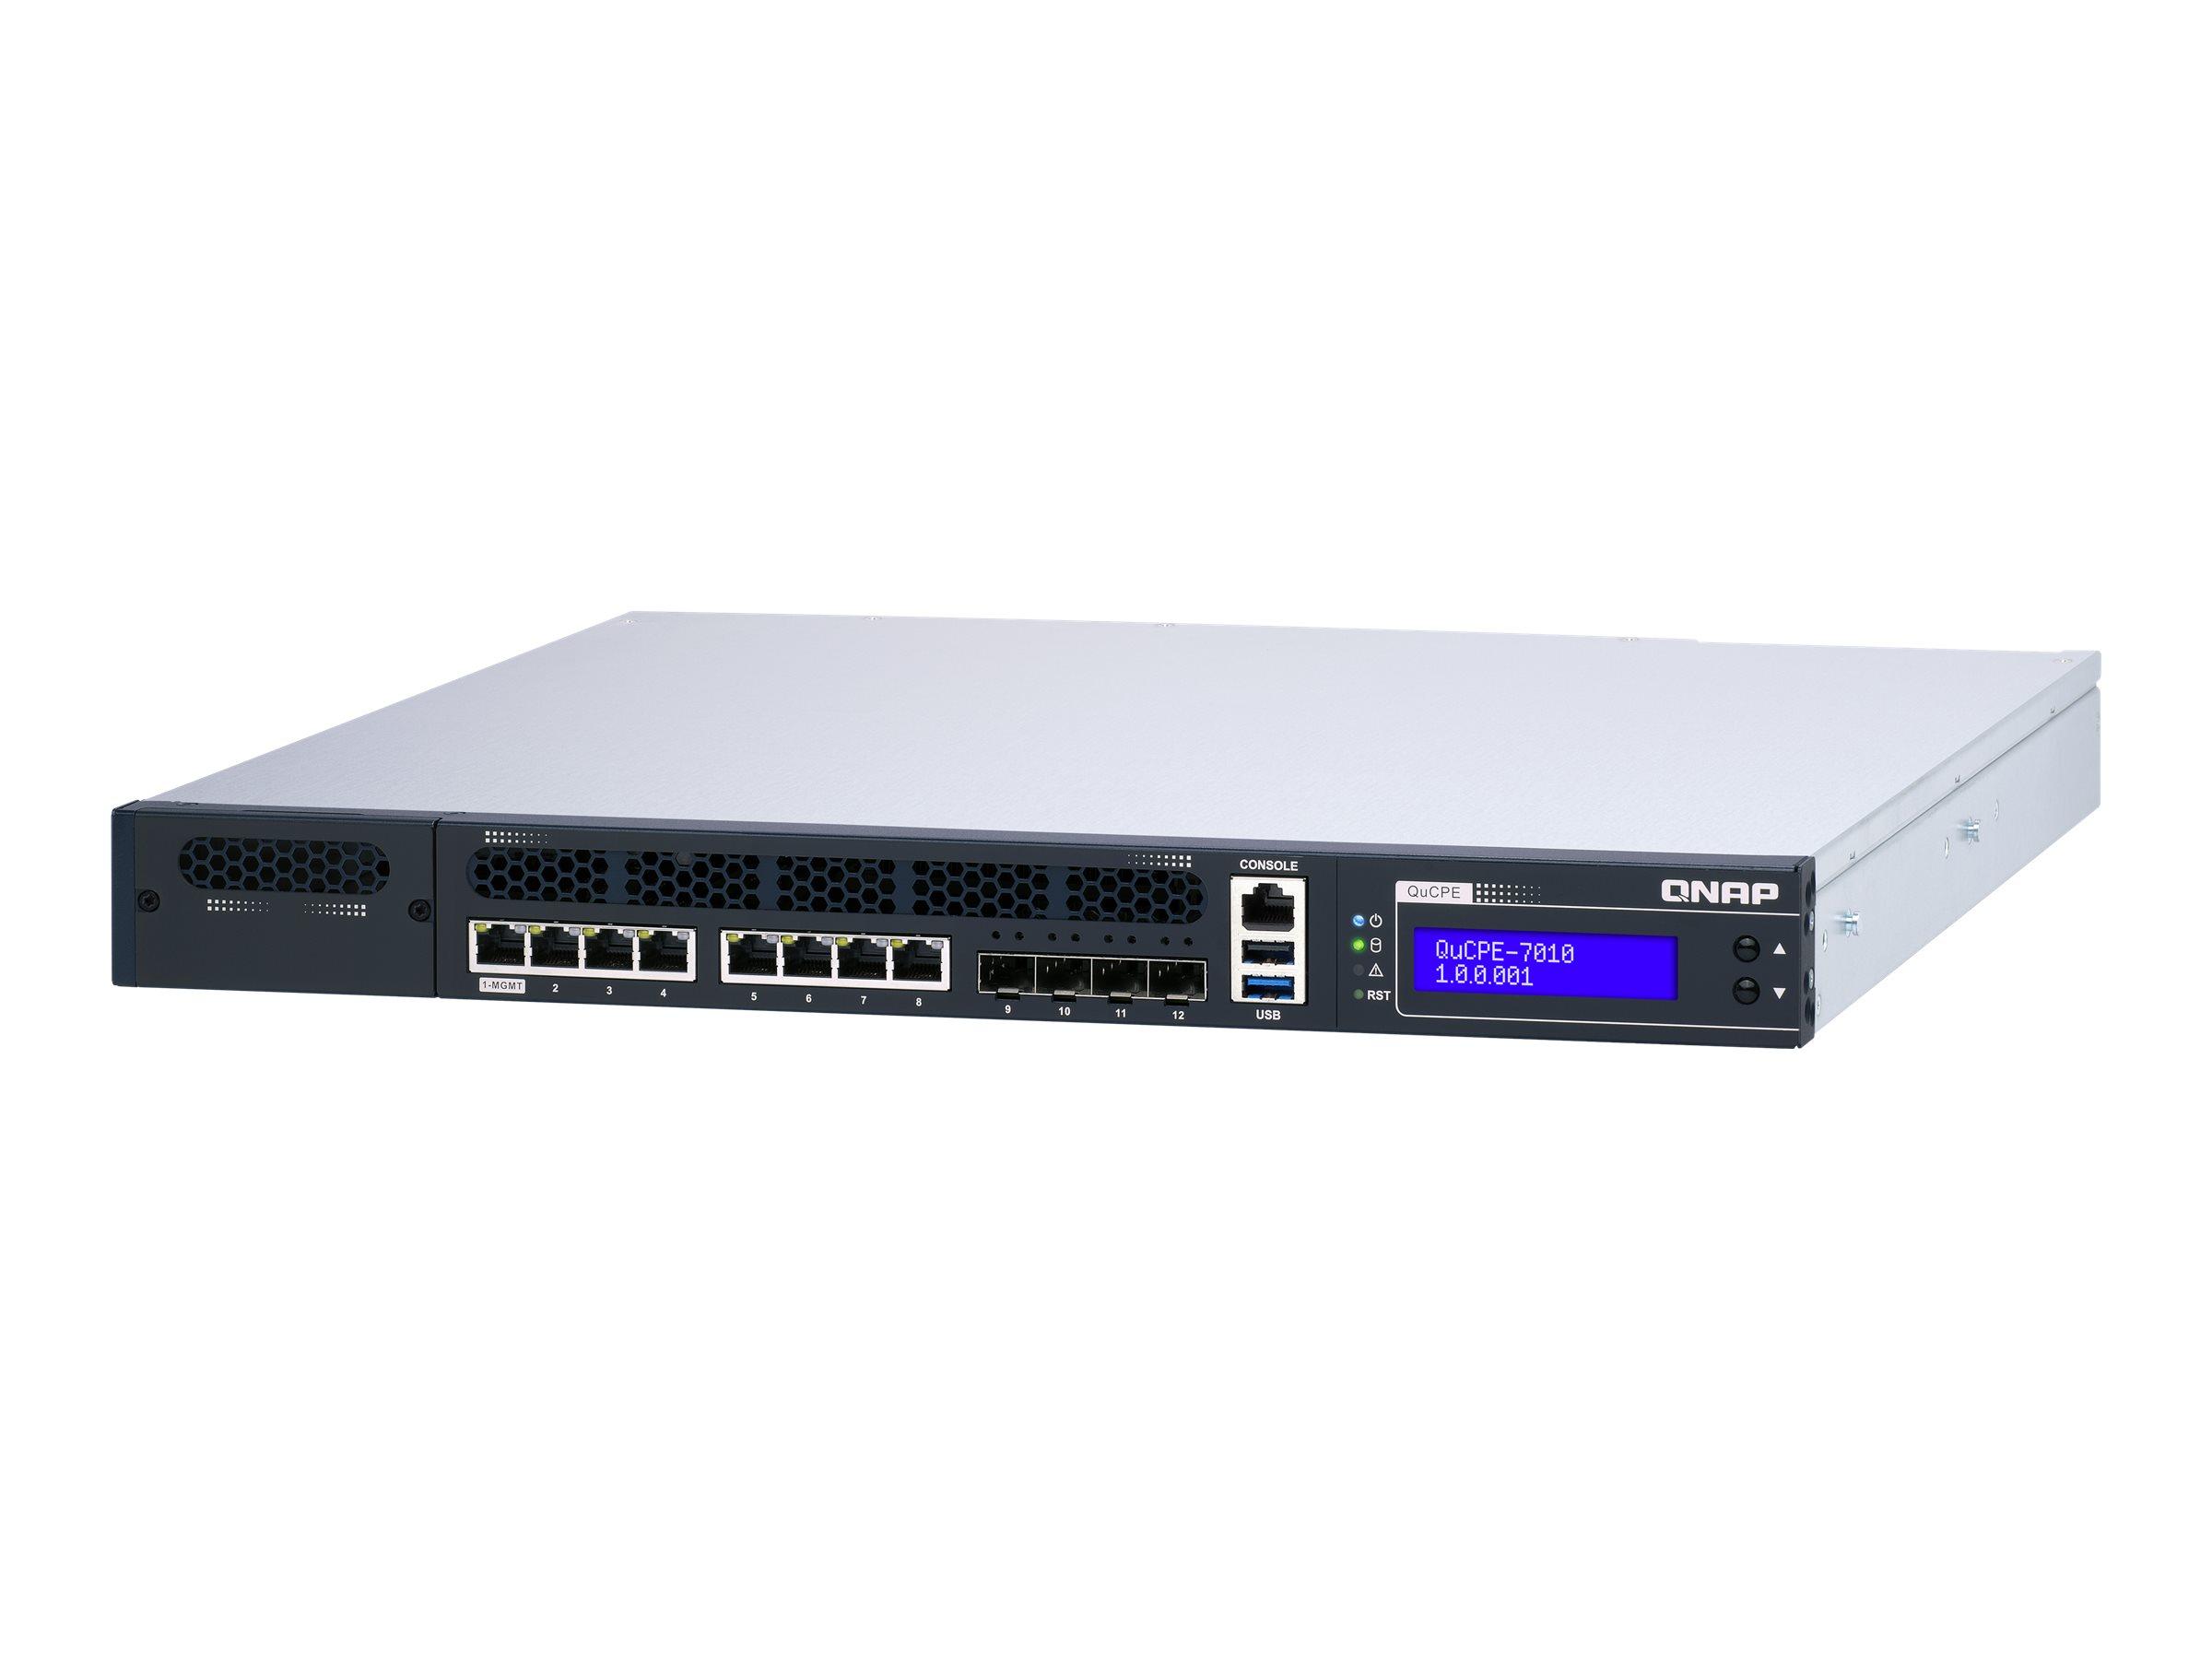 QNAP QuCPE-7010-D2166NT-64GB - virtualization appliance